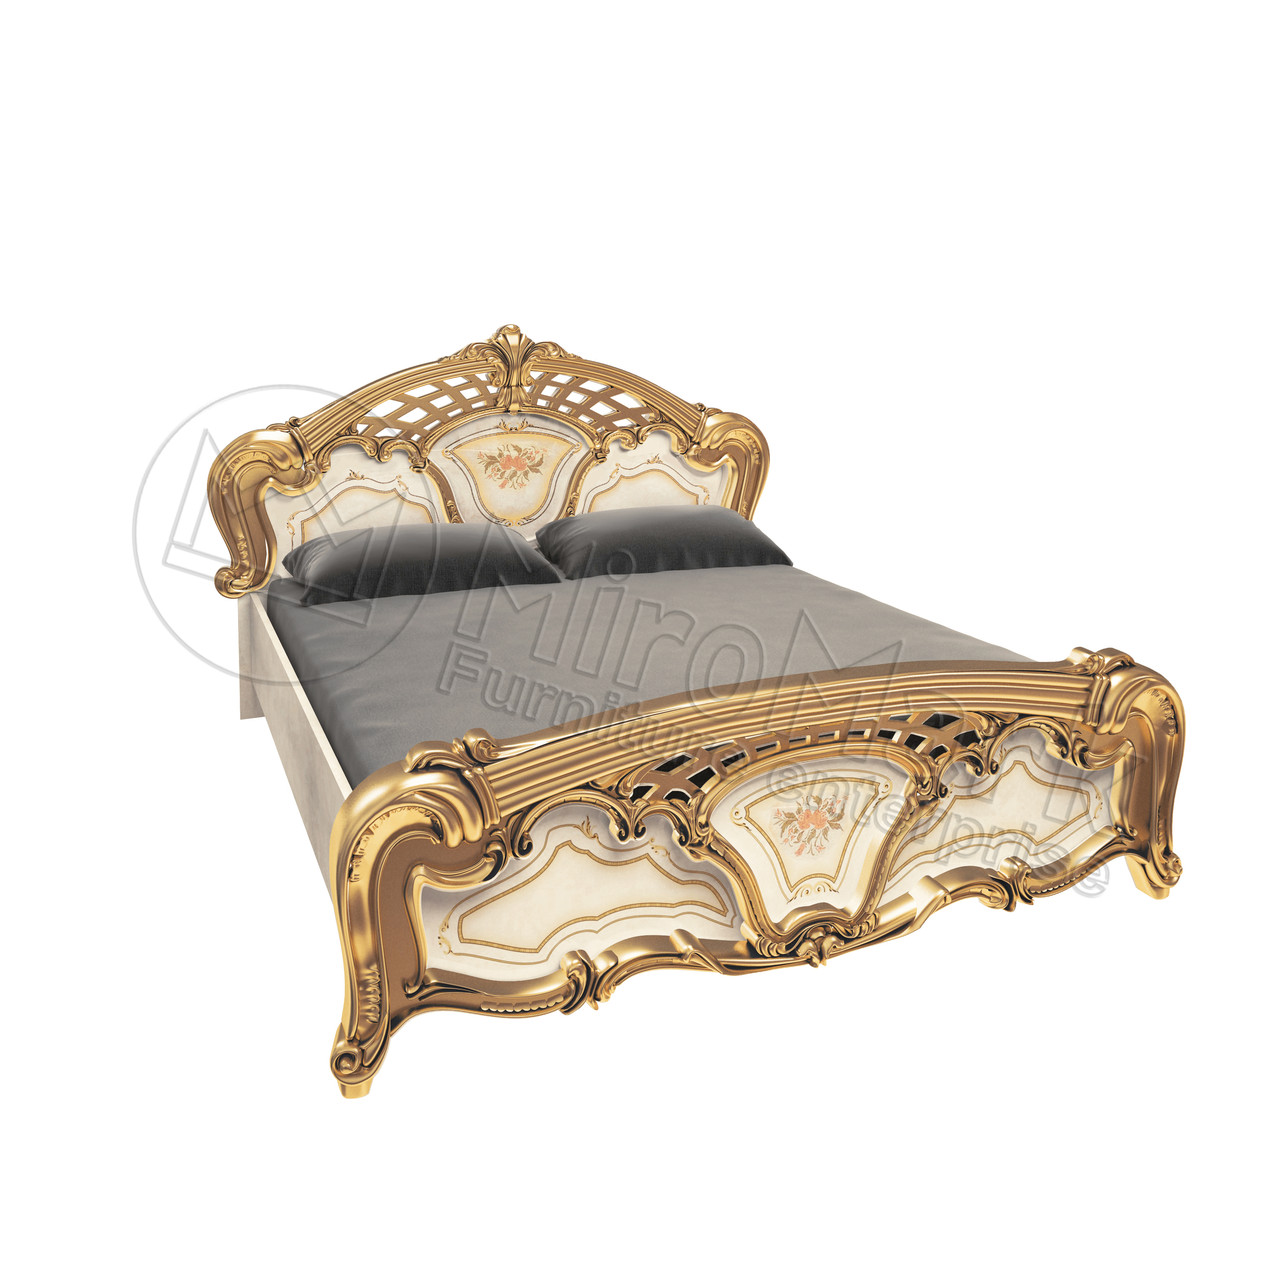 Кровать  «Реджина голд» 1,6 без каркаса. Миро Марк.